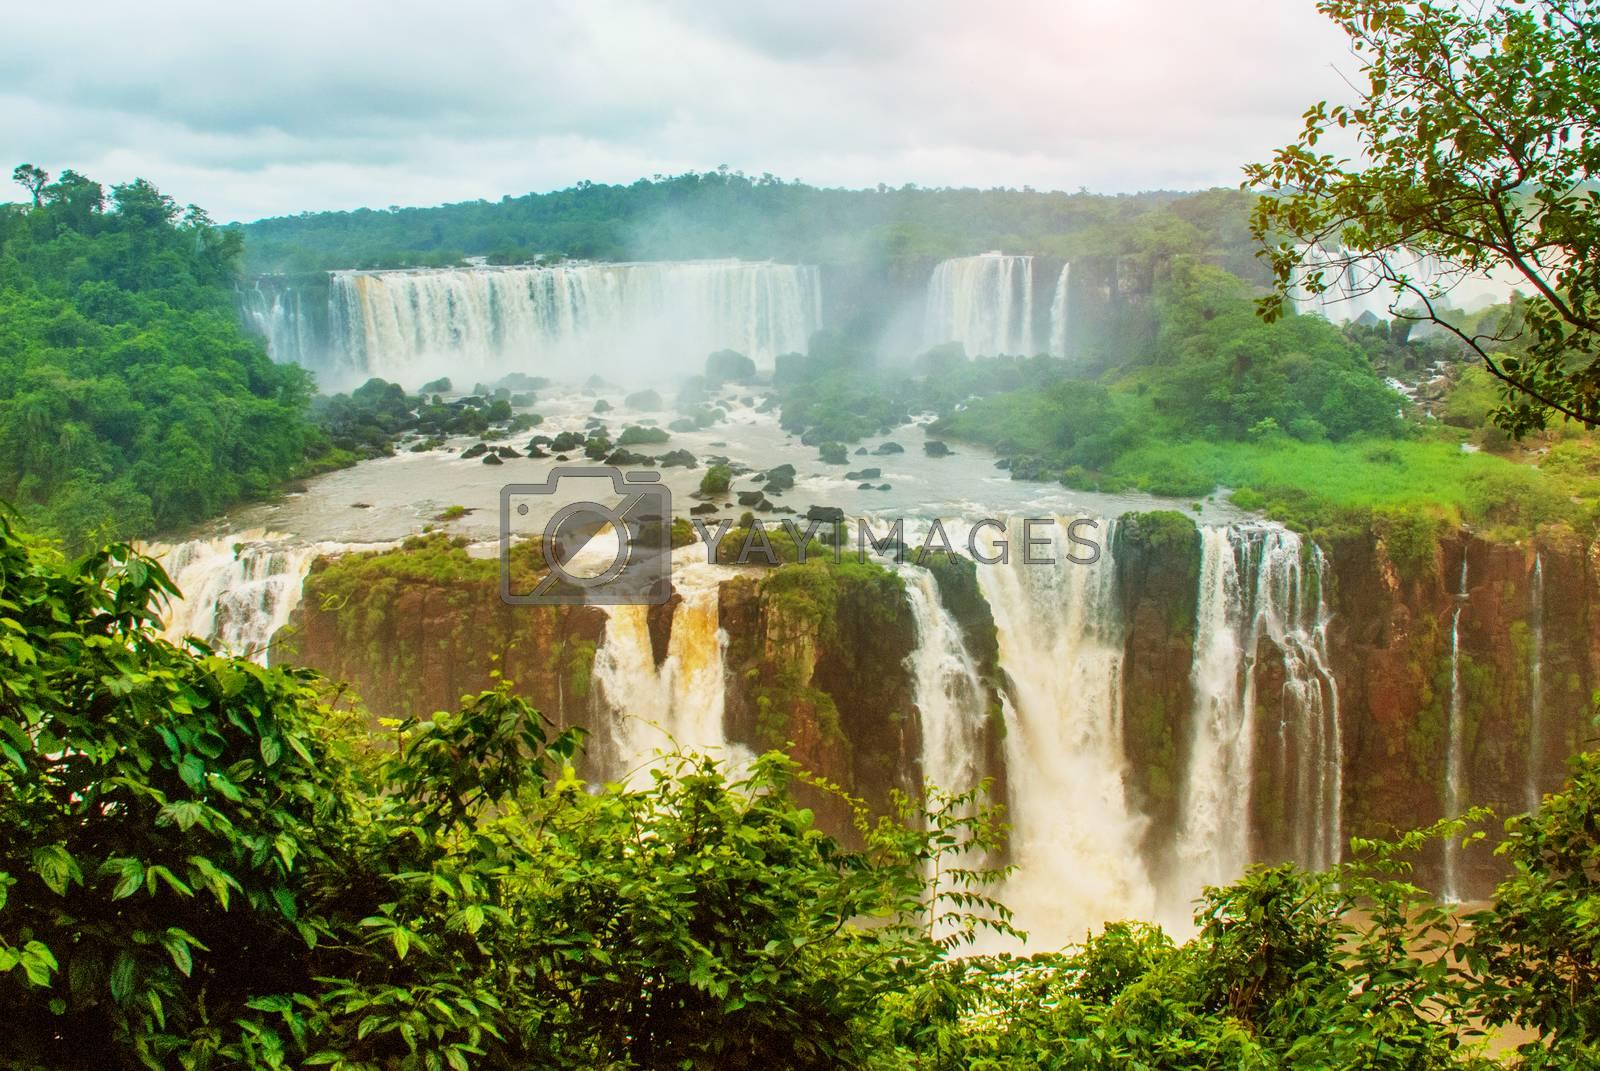 Iguazu falls, one of the new seven wonders of nature. UNESCO World Heritage, view from Brazilian side. Brazil, America.